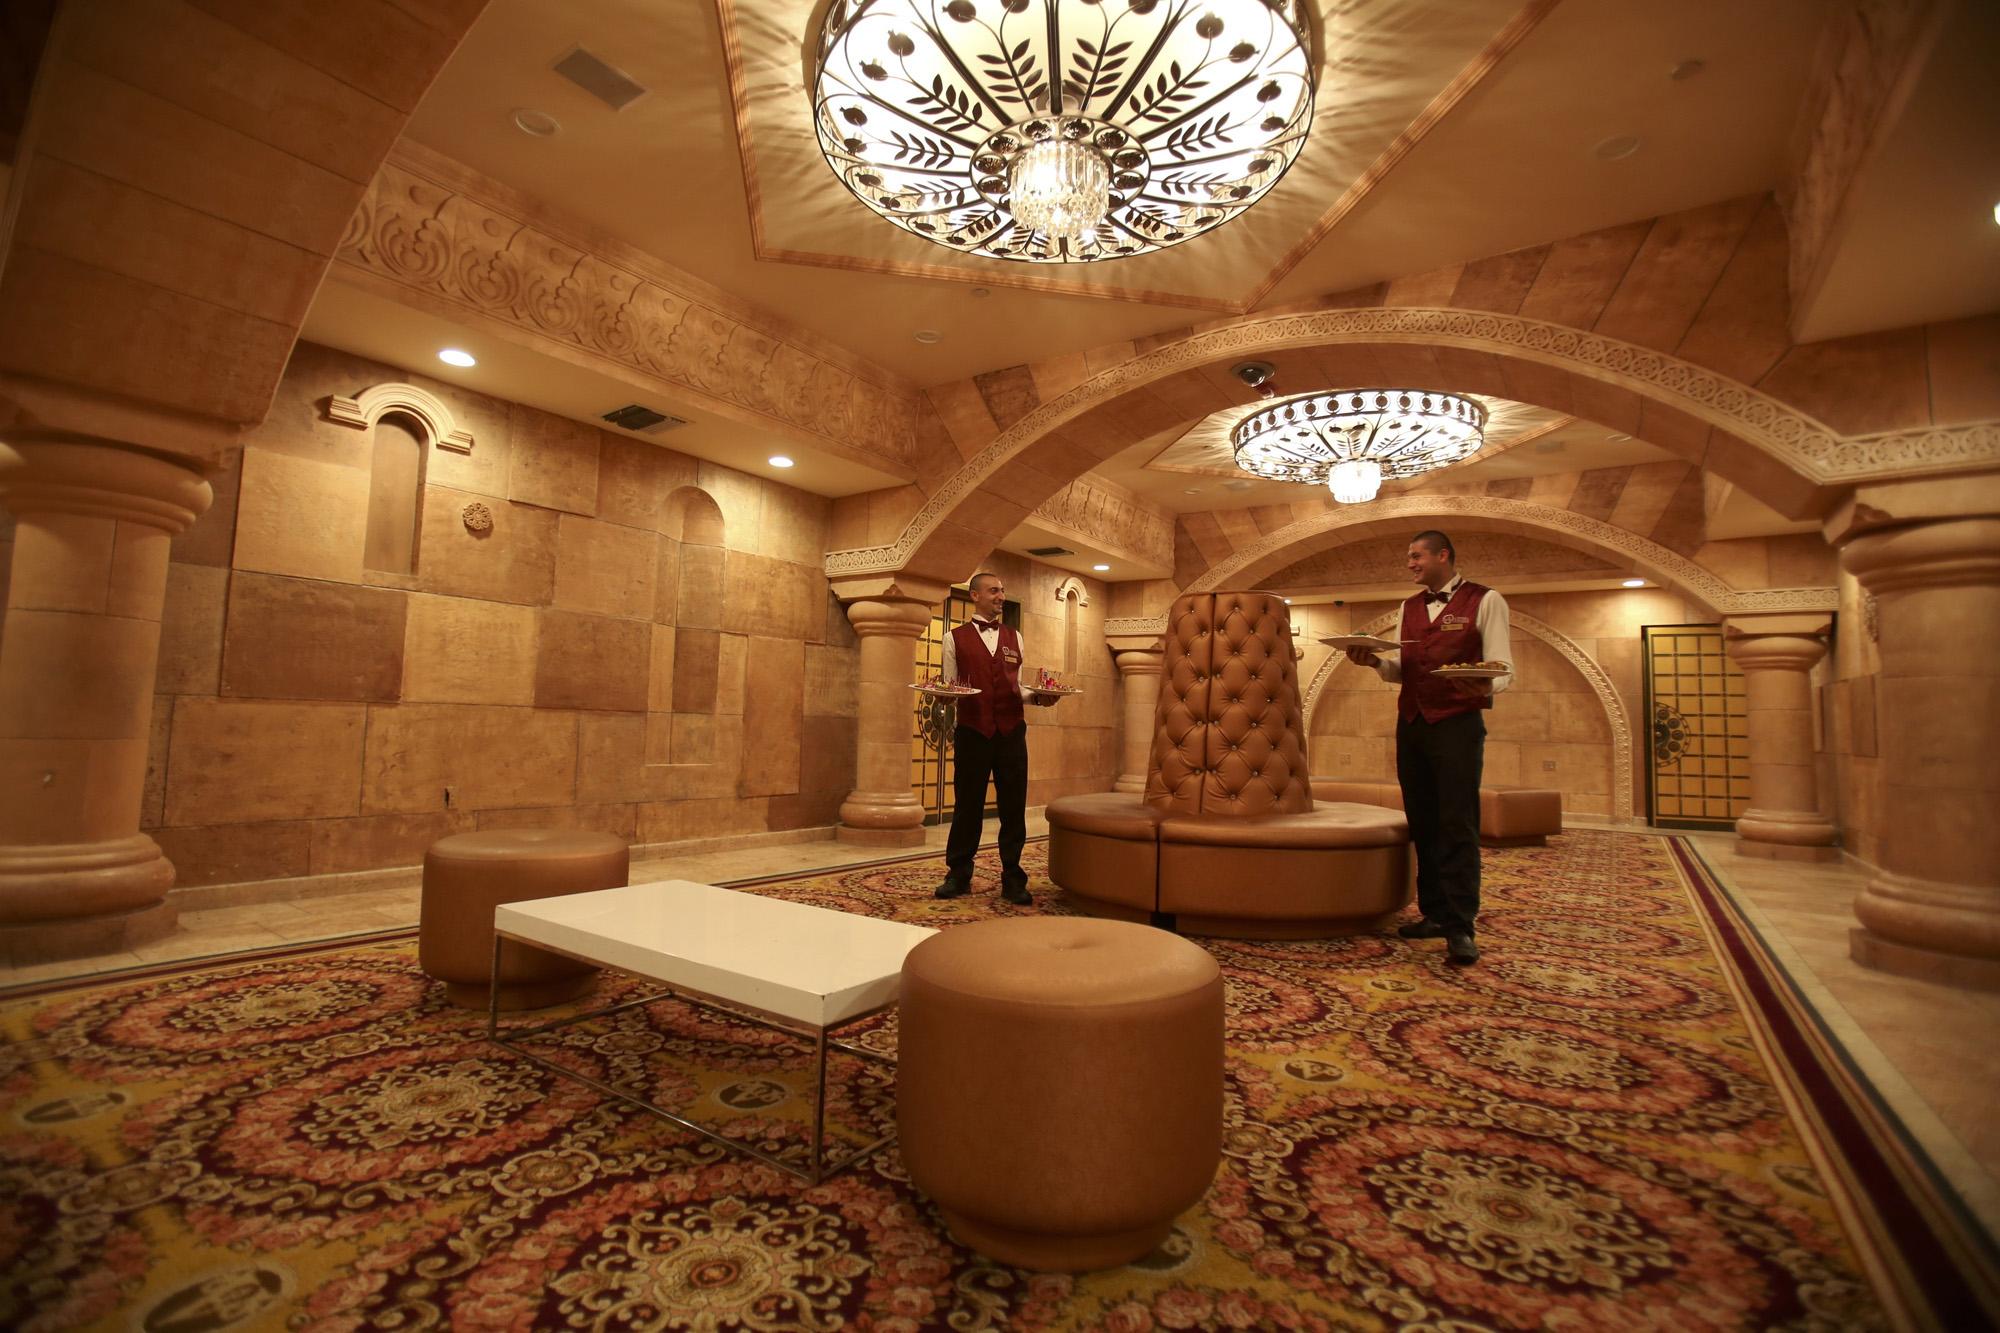 Grand Foyer Bar : Small event wedding venue in n hollywood le foyer lounge